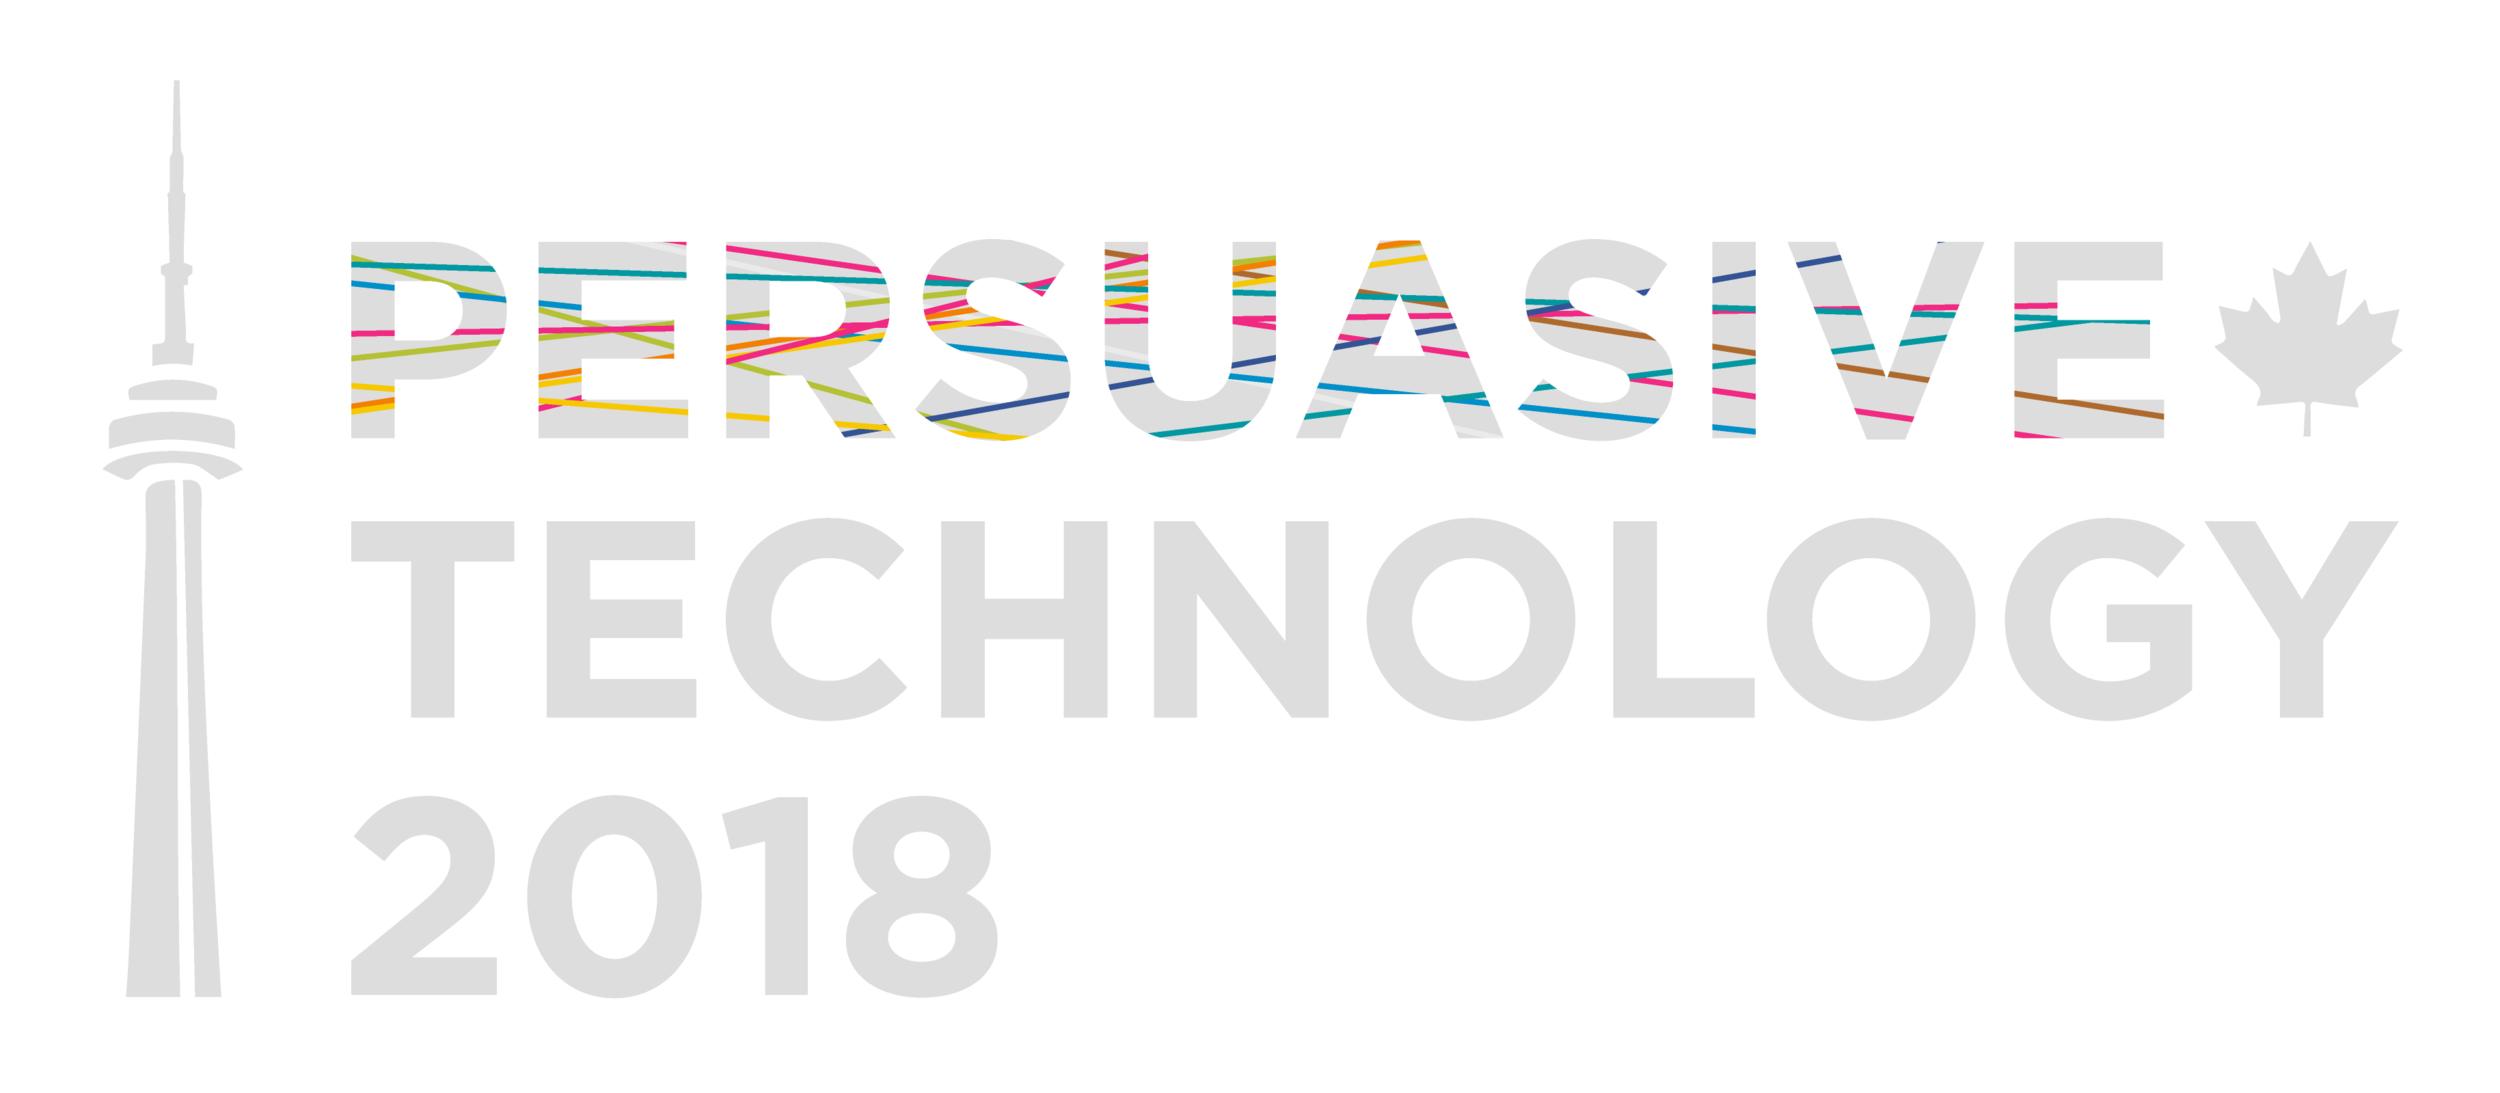 Persuasive2018-Logo-Master-21-e1501359212831-1.png